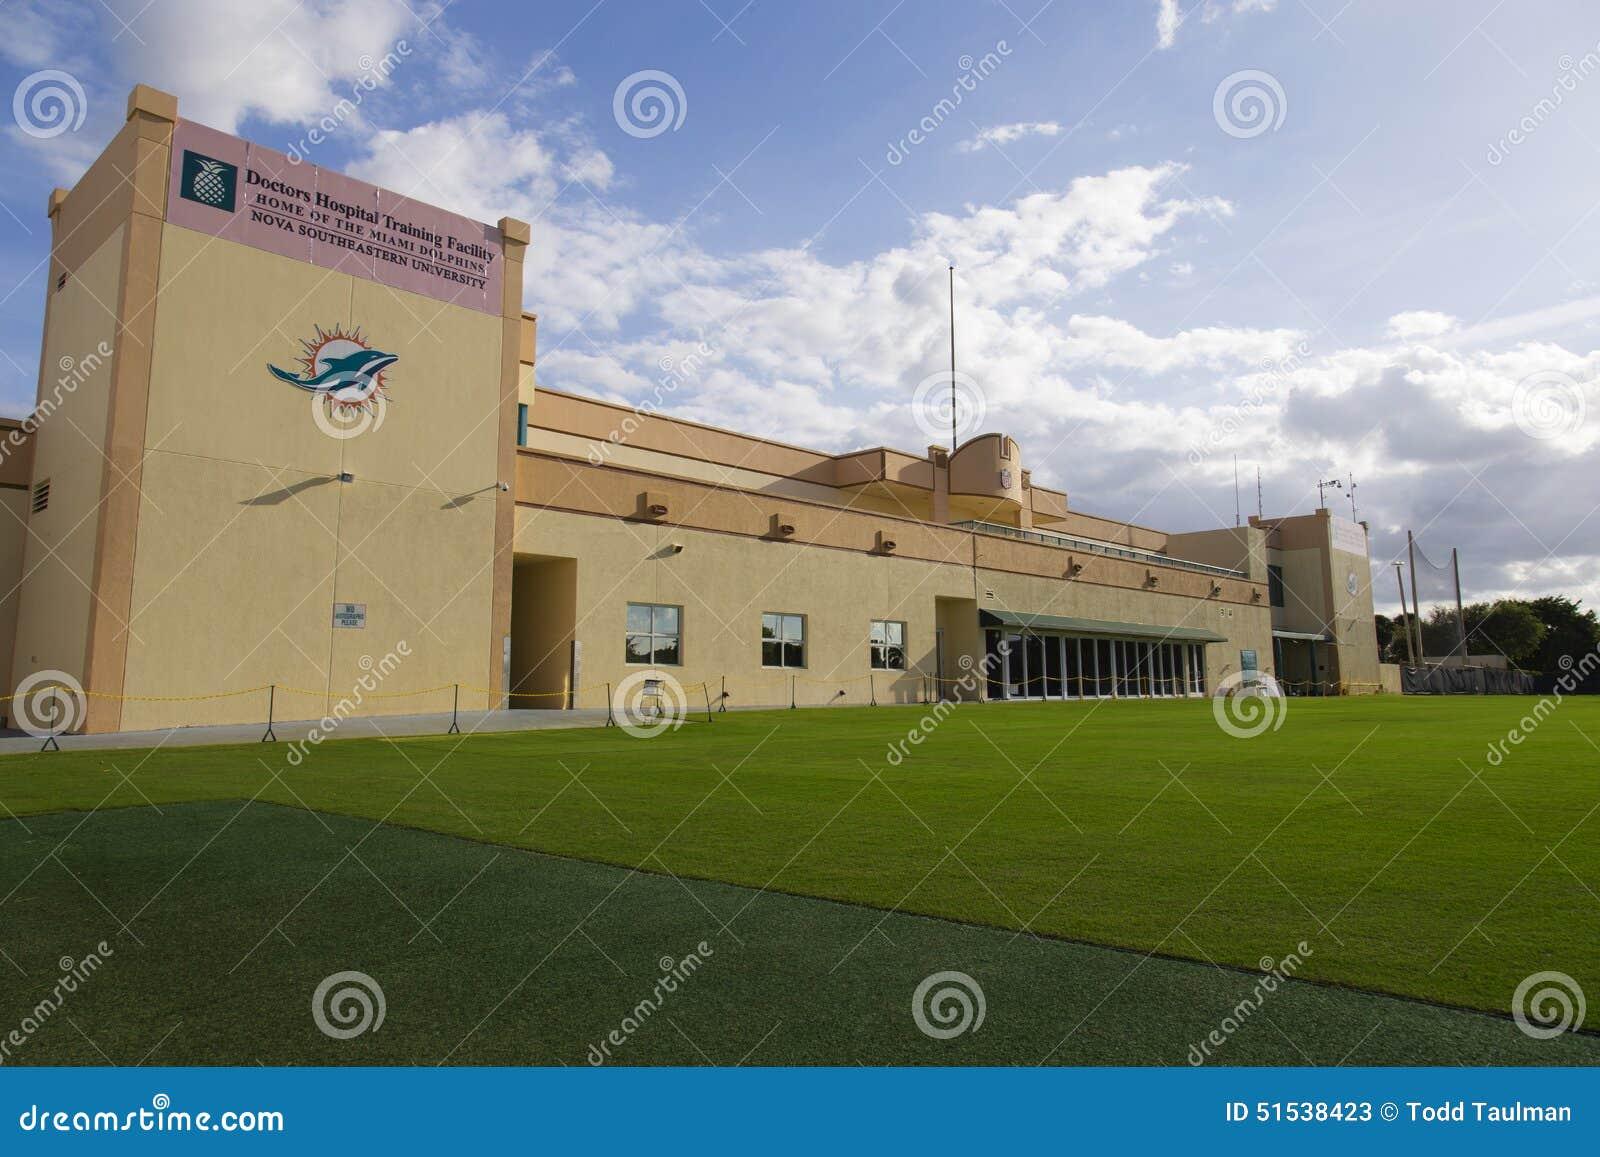 Forex miami training center